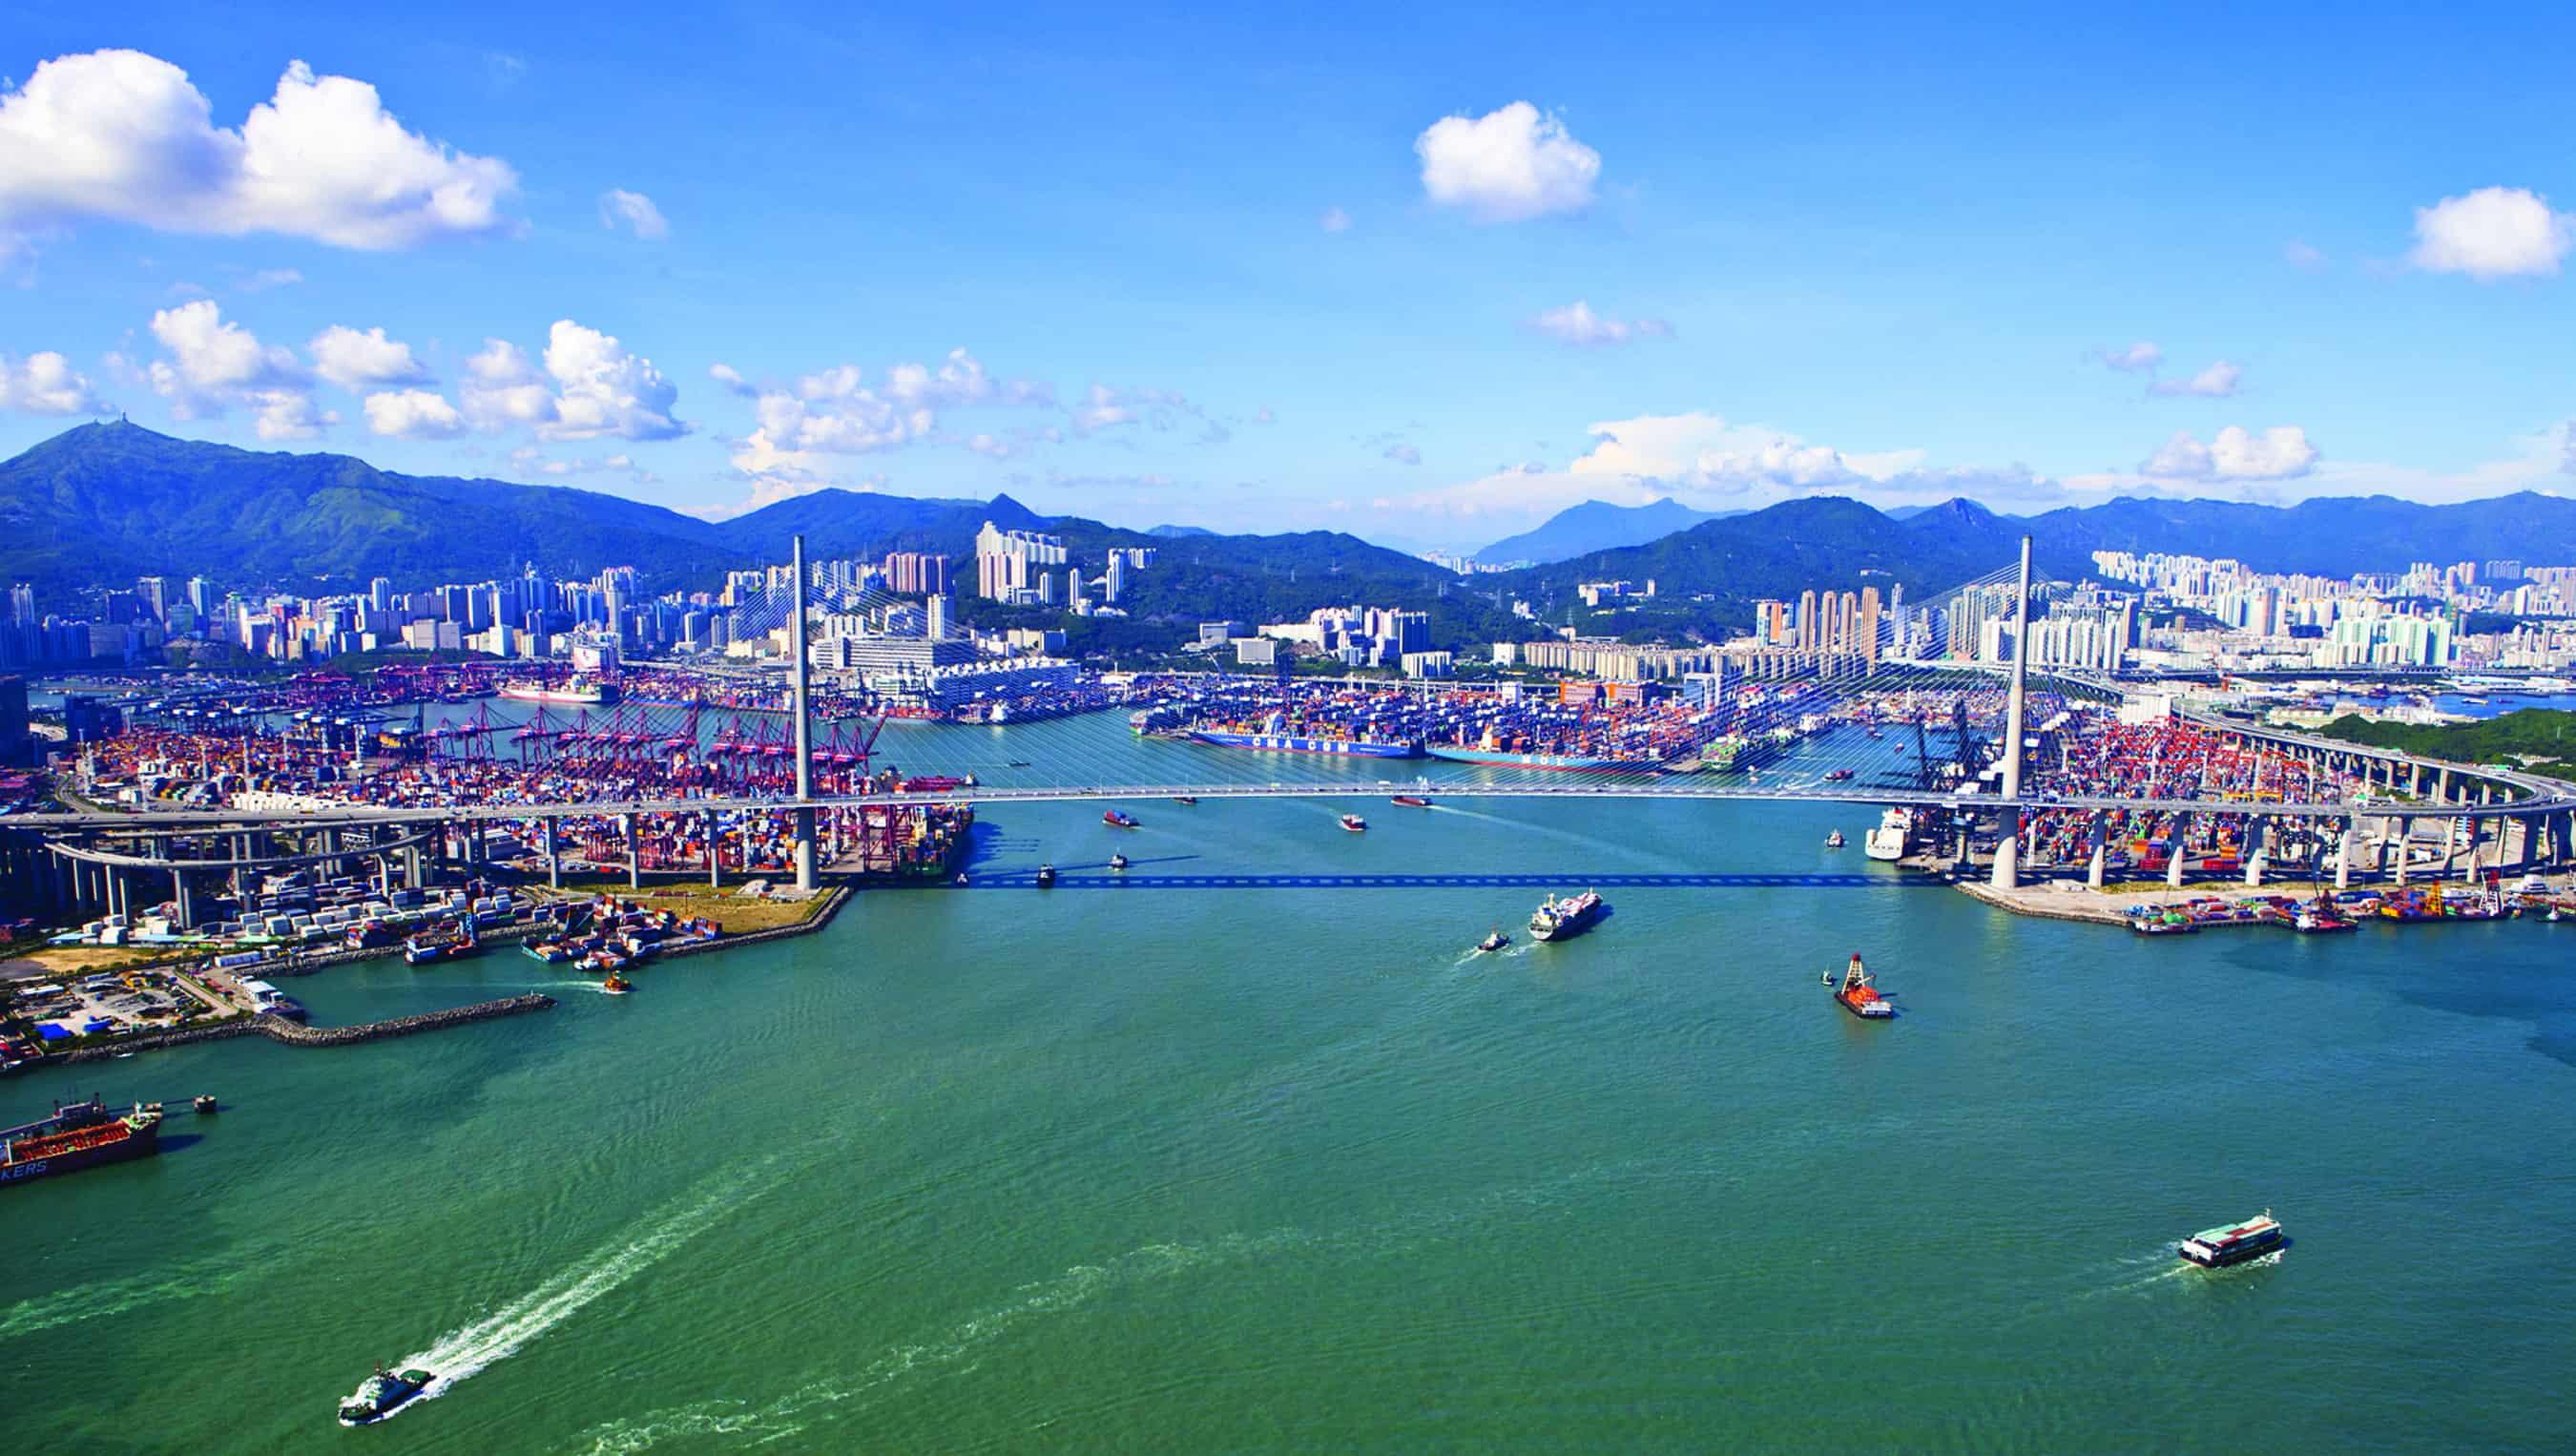 Hong Kong considers building homes above port